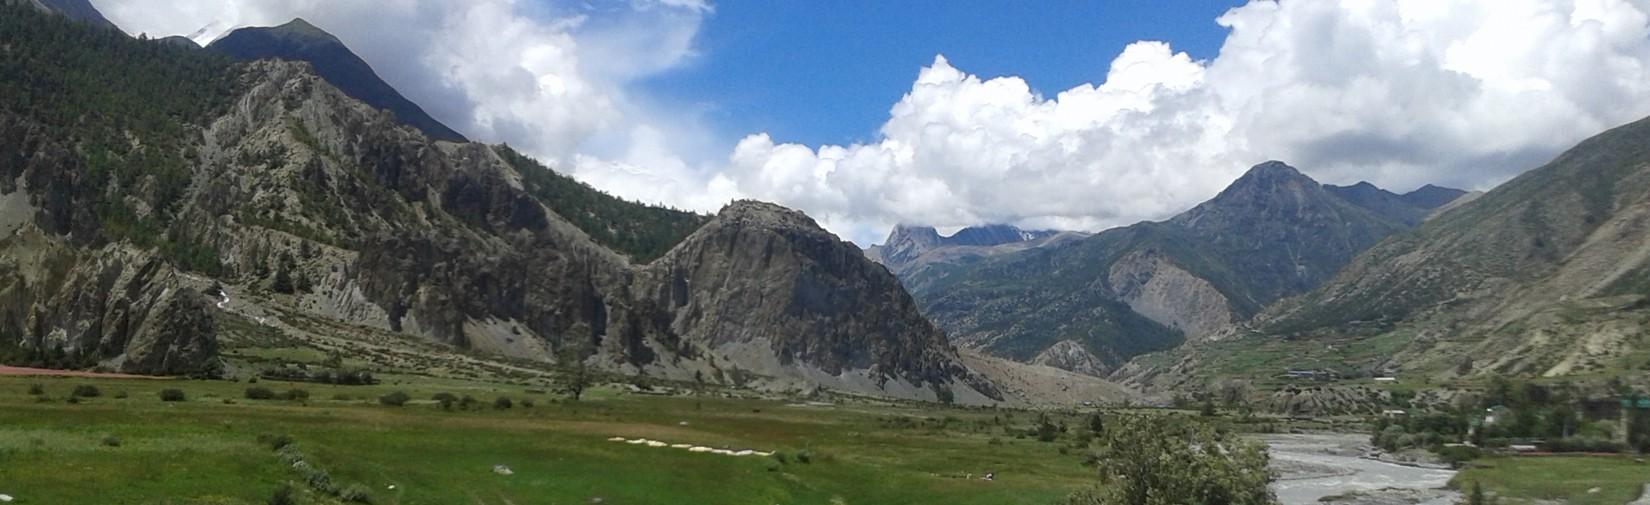 valley-of-manang-seen-from-braka-annapurna circuit